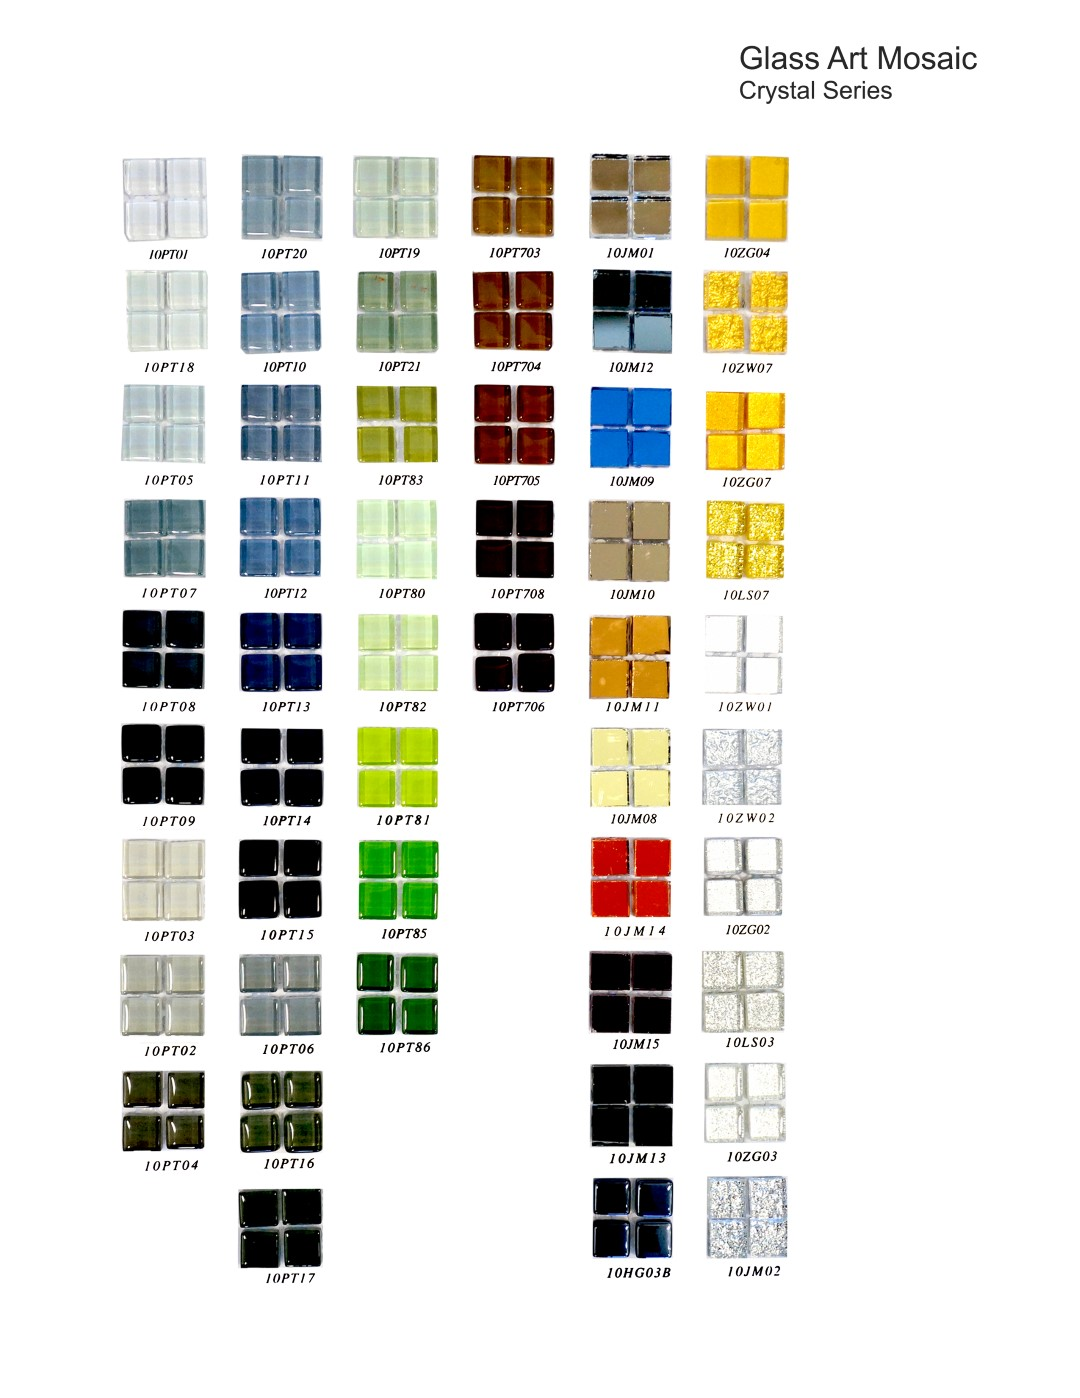 Glass Art Mosaic Crystal 2 Series (Large).jpg